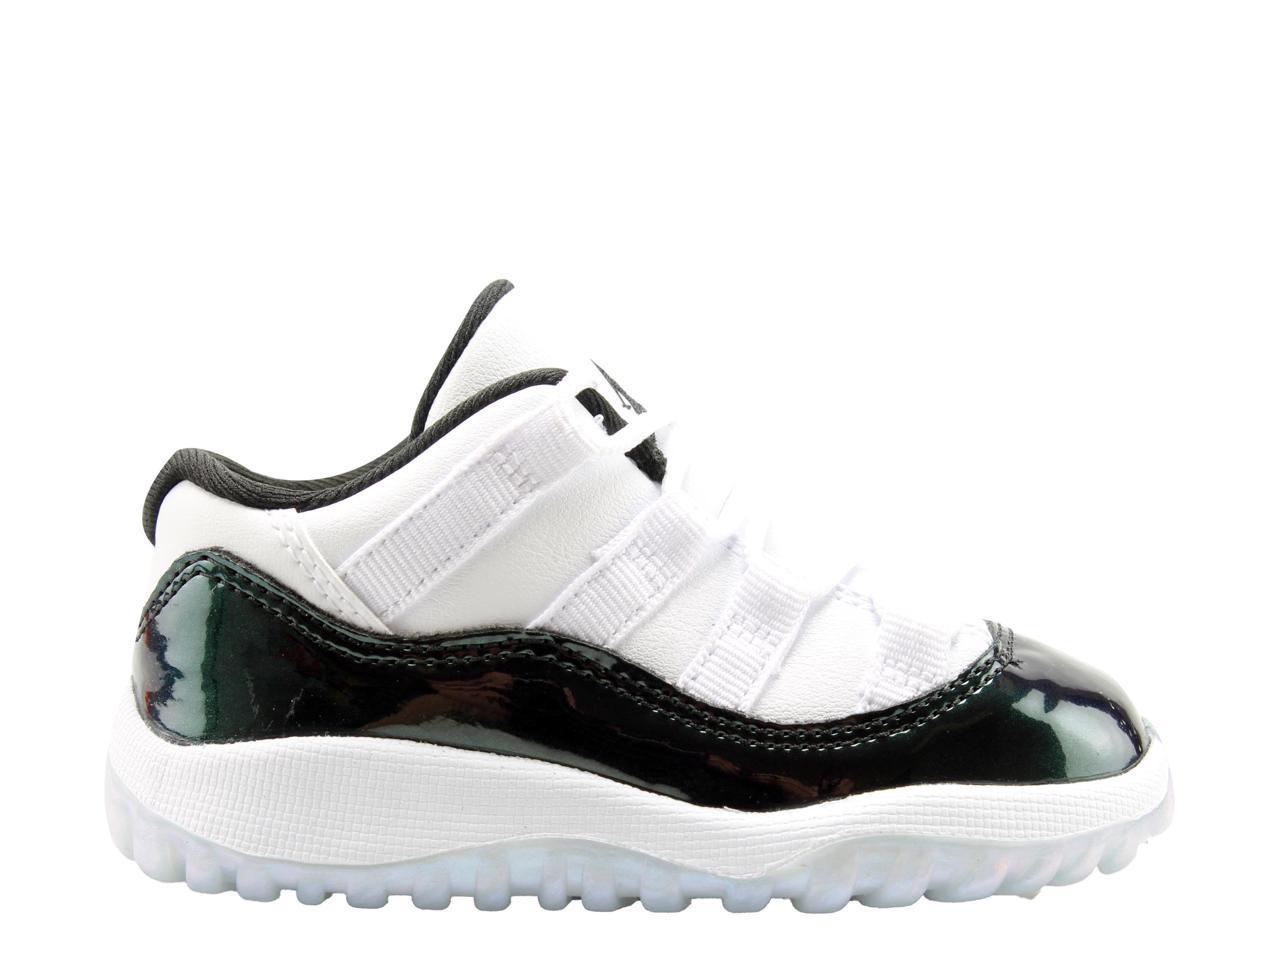 Nike Air Jordan 11 Retro Retro Retro Low BT Emerald Toddler Basketball Shoes 505836-145 Size 10 6928fa